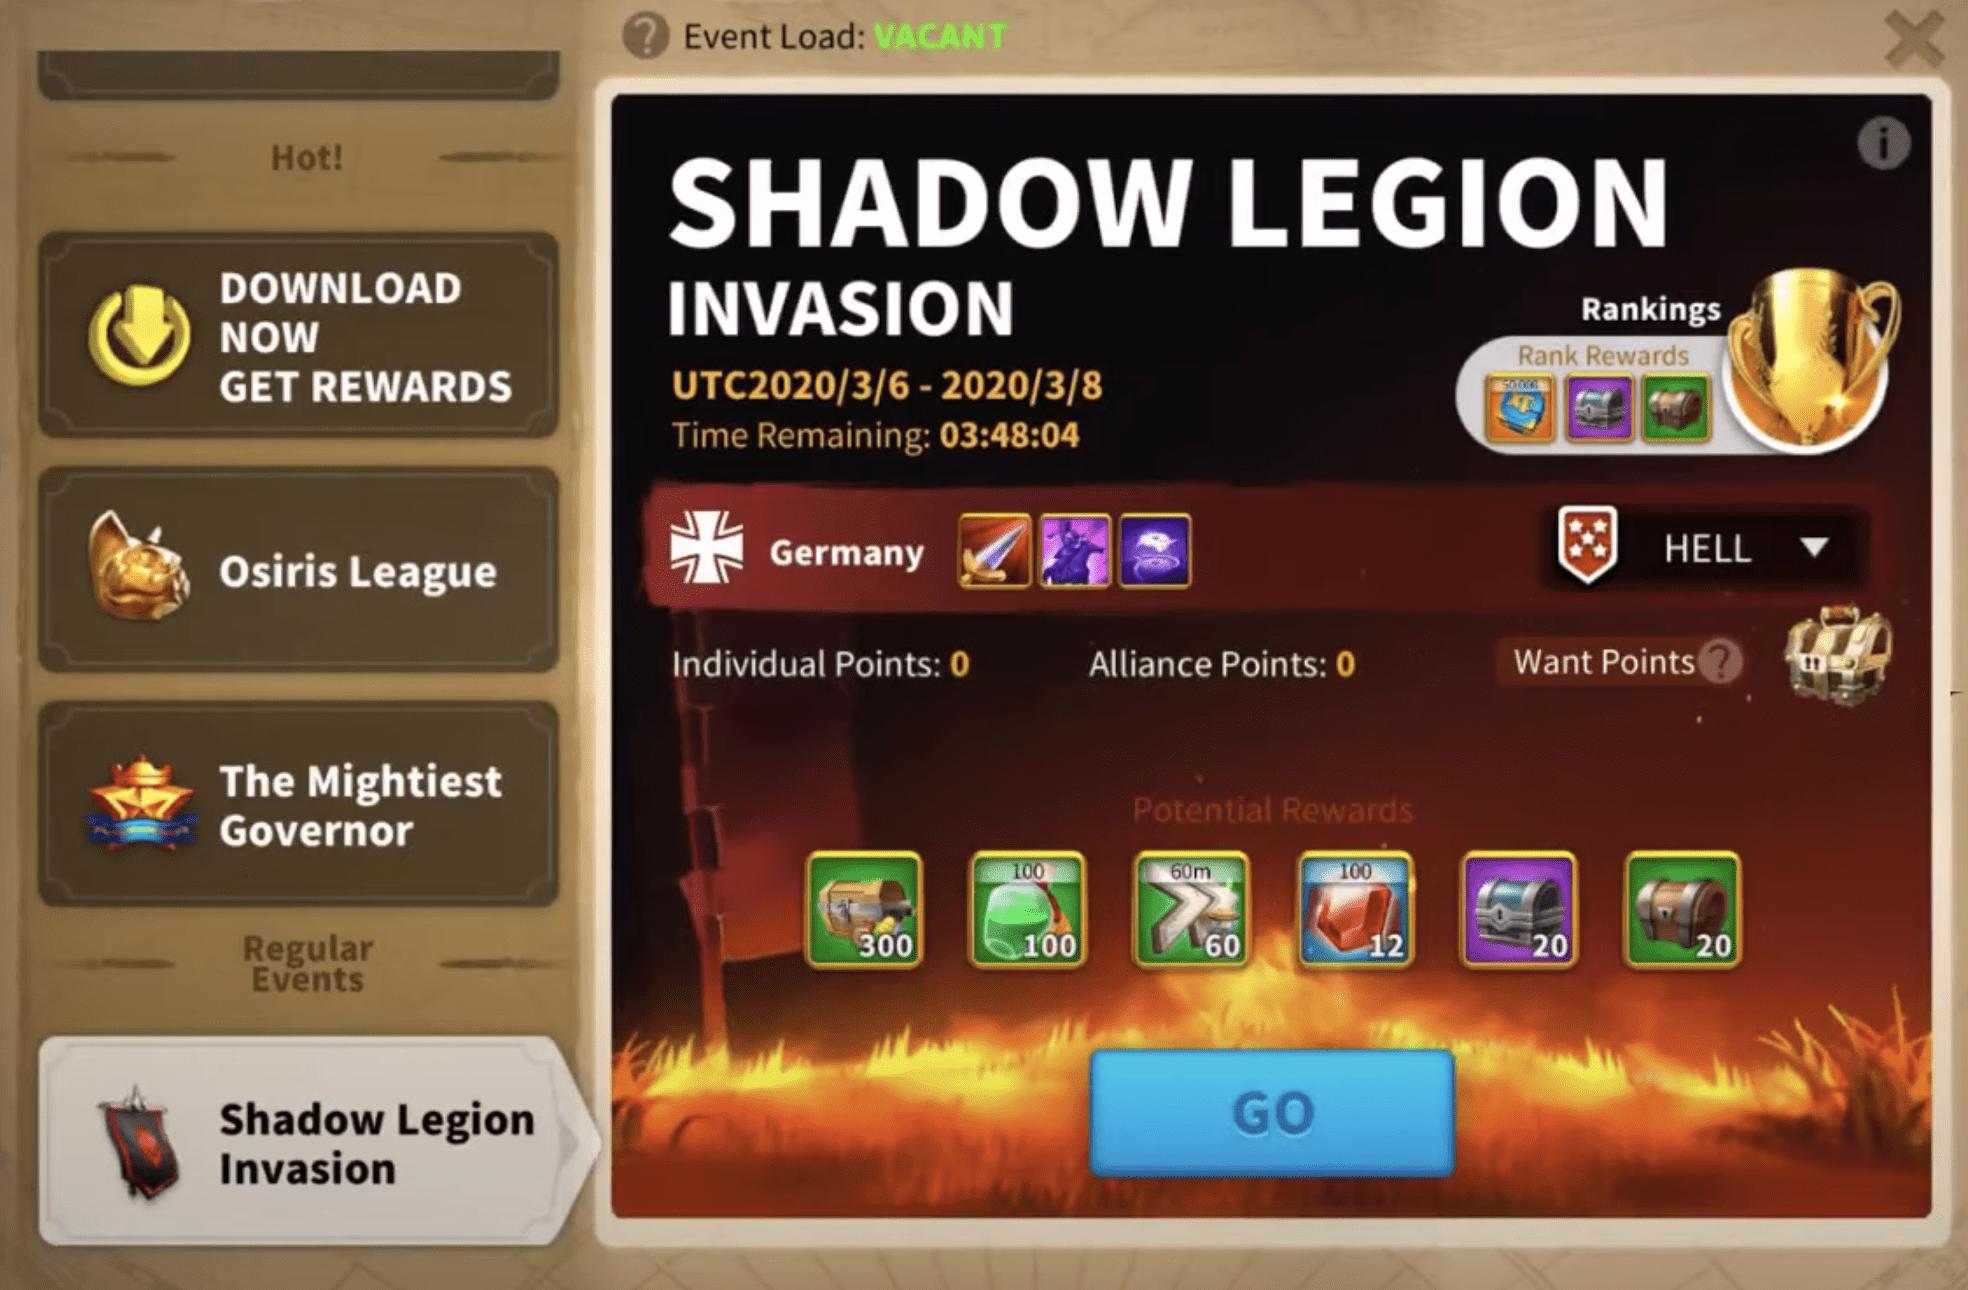 shadow legion invasion event